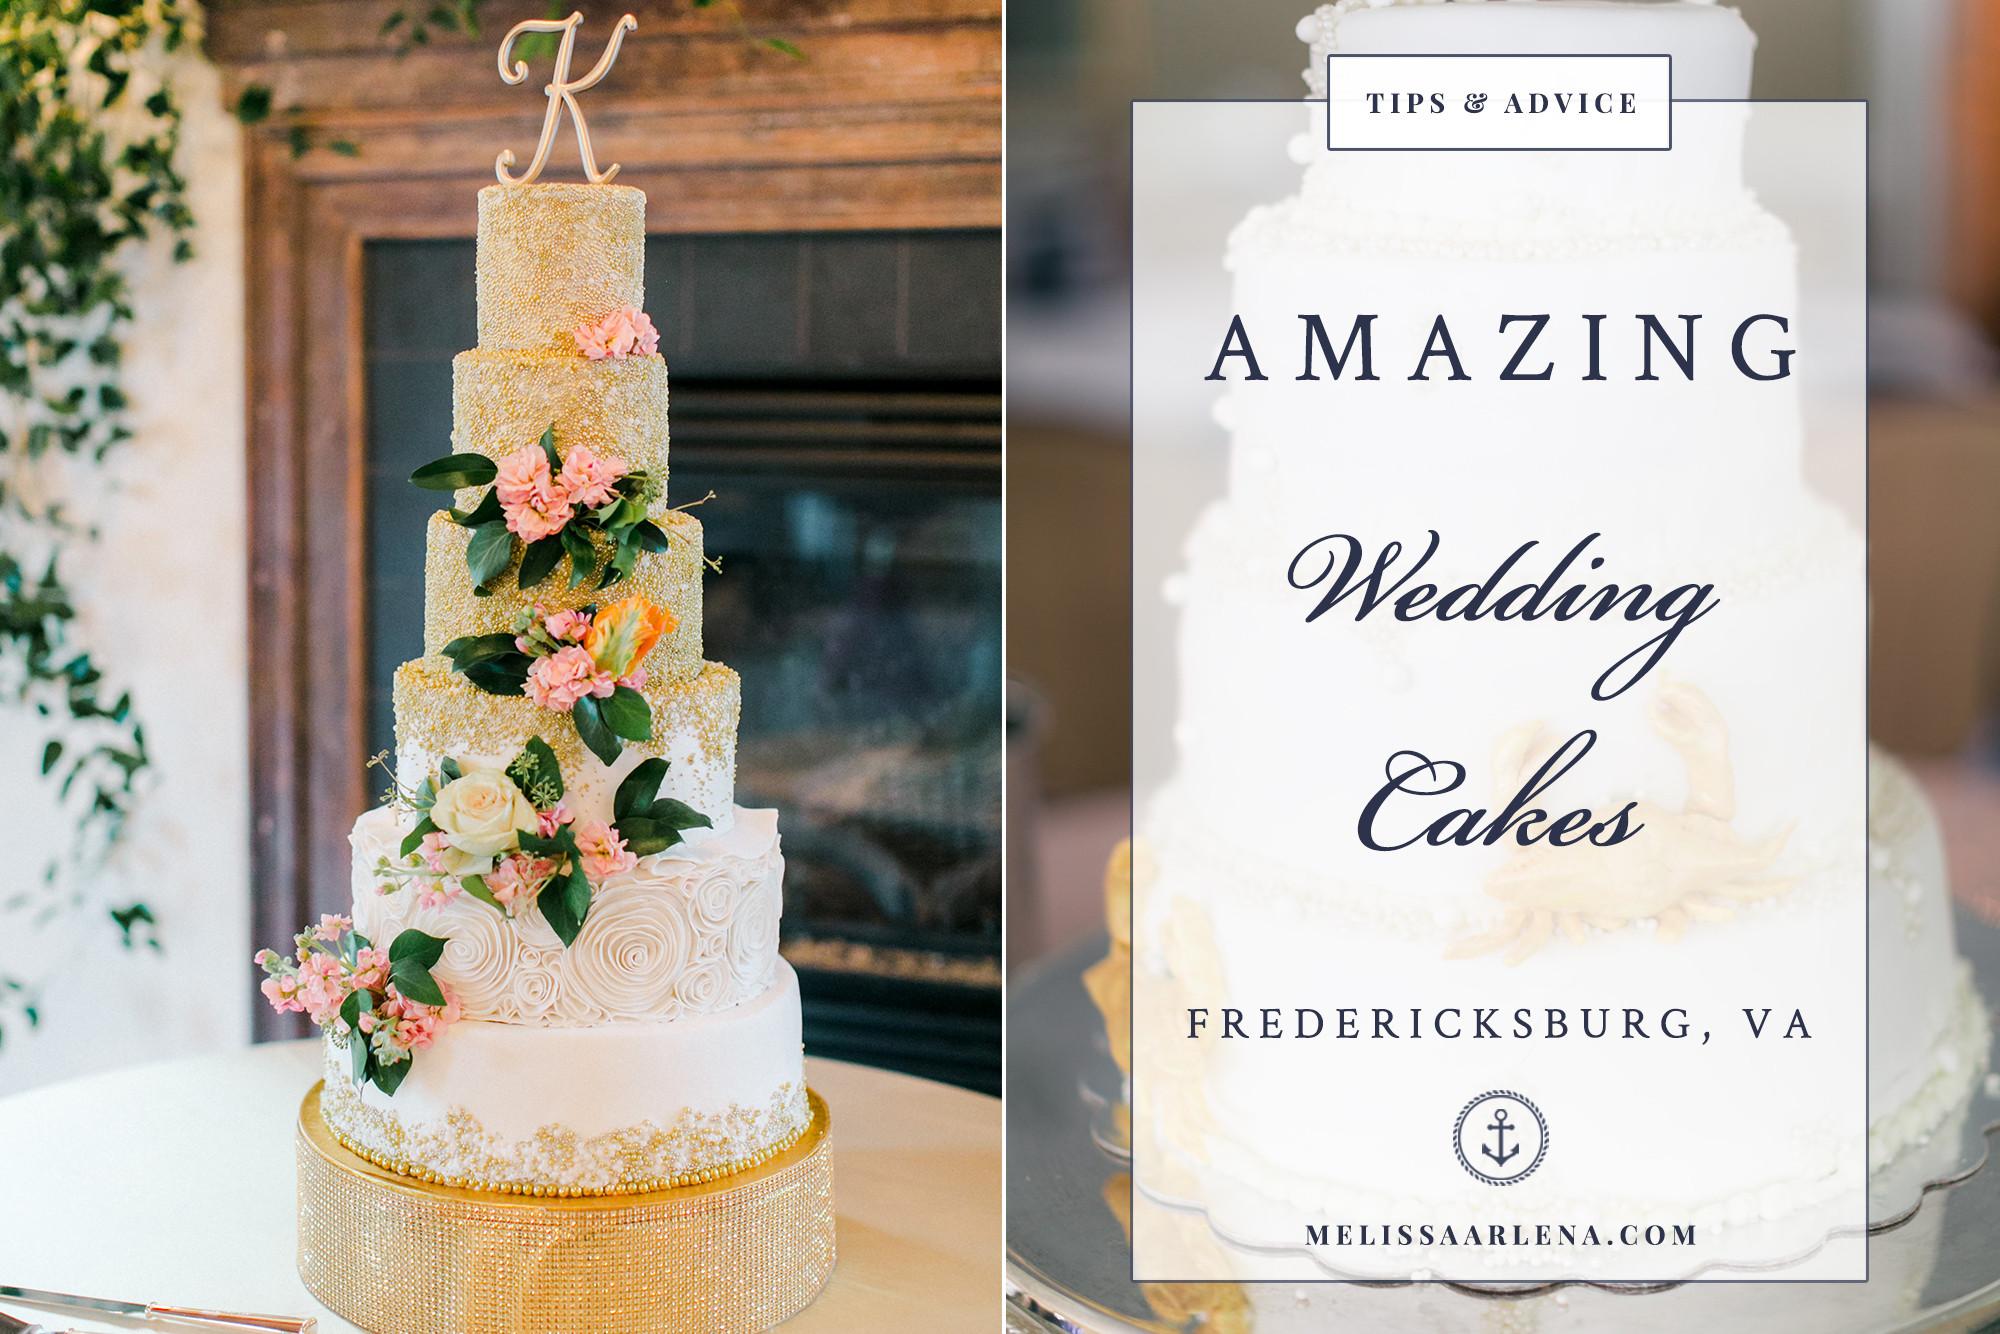 Wedding Cakes Fredericksburg Va  Amazing Wedding Cakes Fredericksburg Va